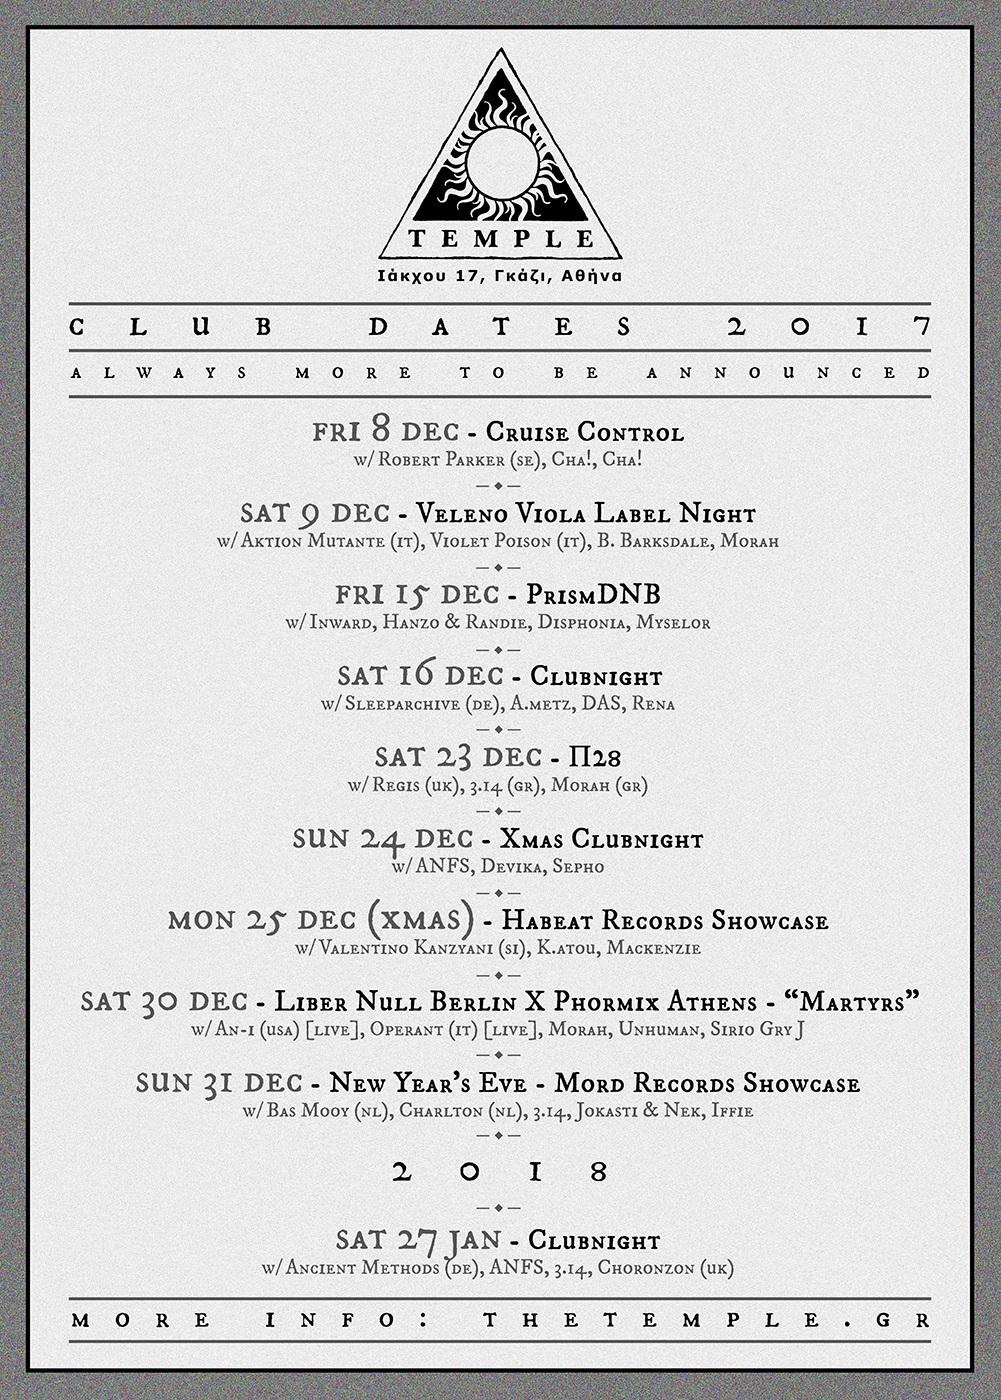 news/171208-temple-clubnights-december-01.jpg